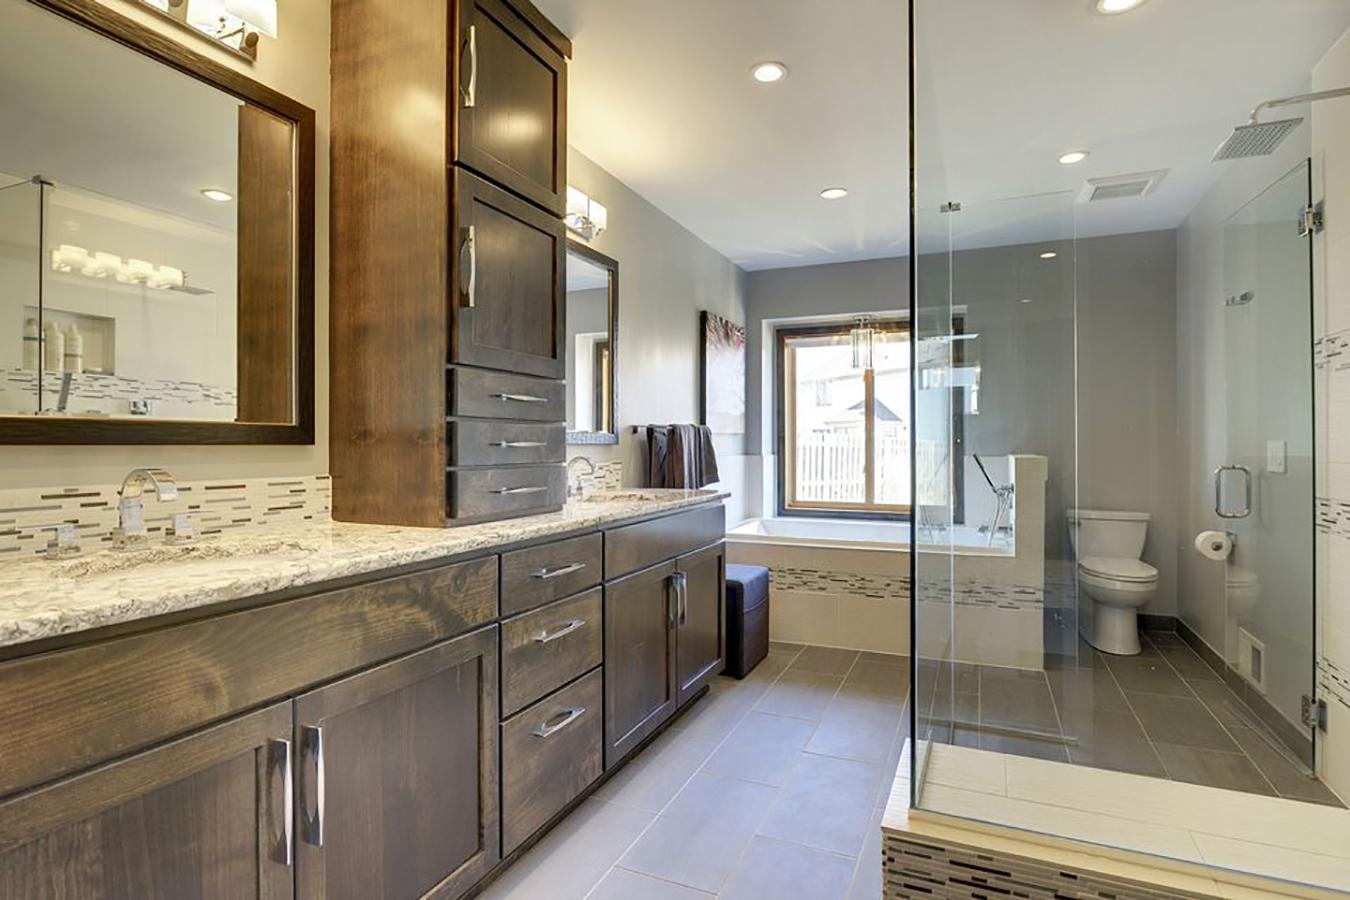 Bathroom Remodeling Chicago  Remodeling Contractors